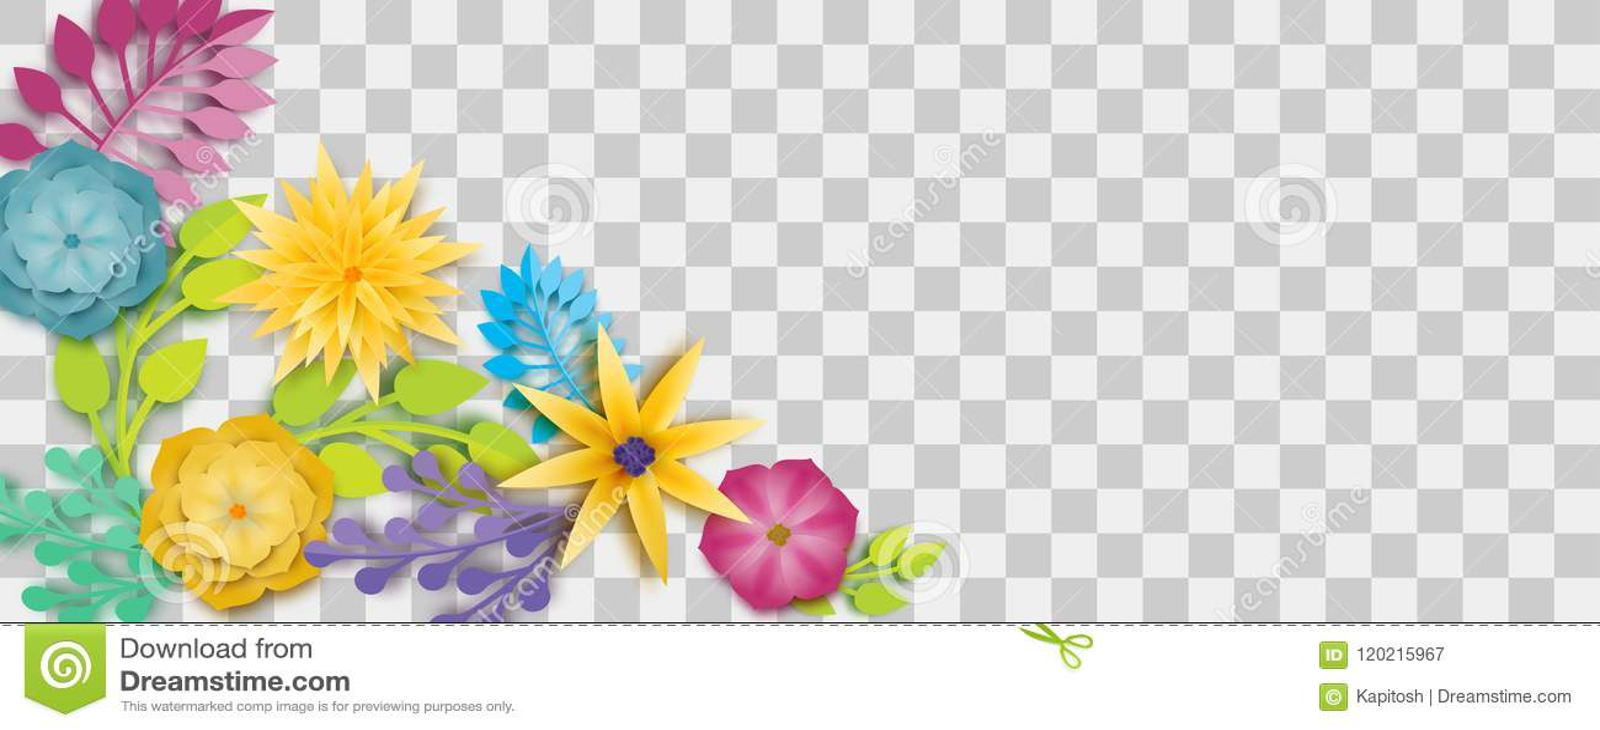 Paper Origami Flower Vector Stock Vector Illustration Of Green